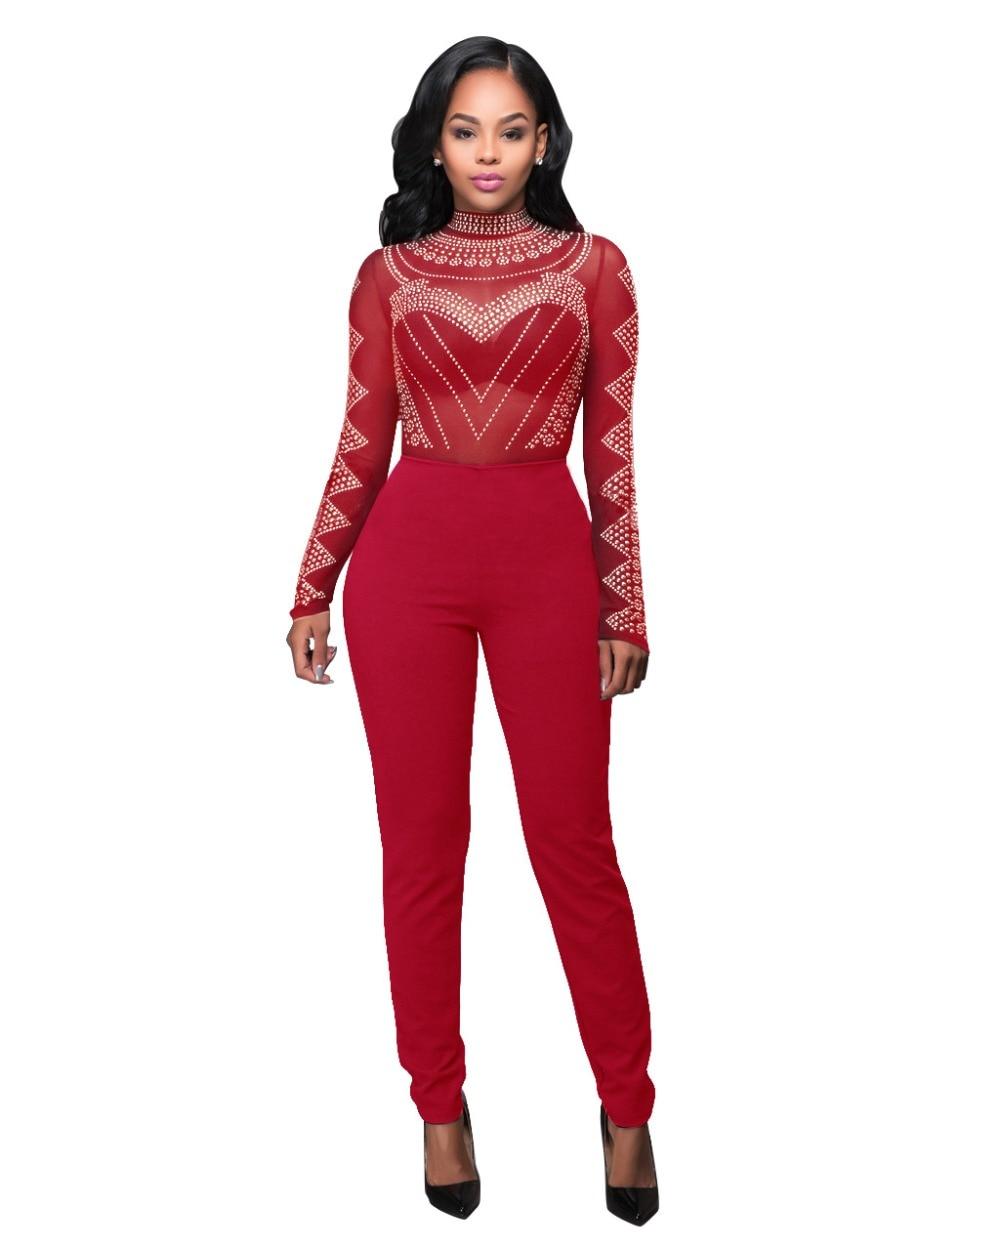 Women Mesh Printed Club Jumpsuits See Through Long Sleeve ...